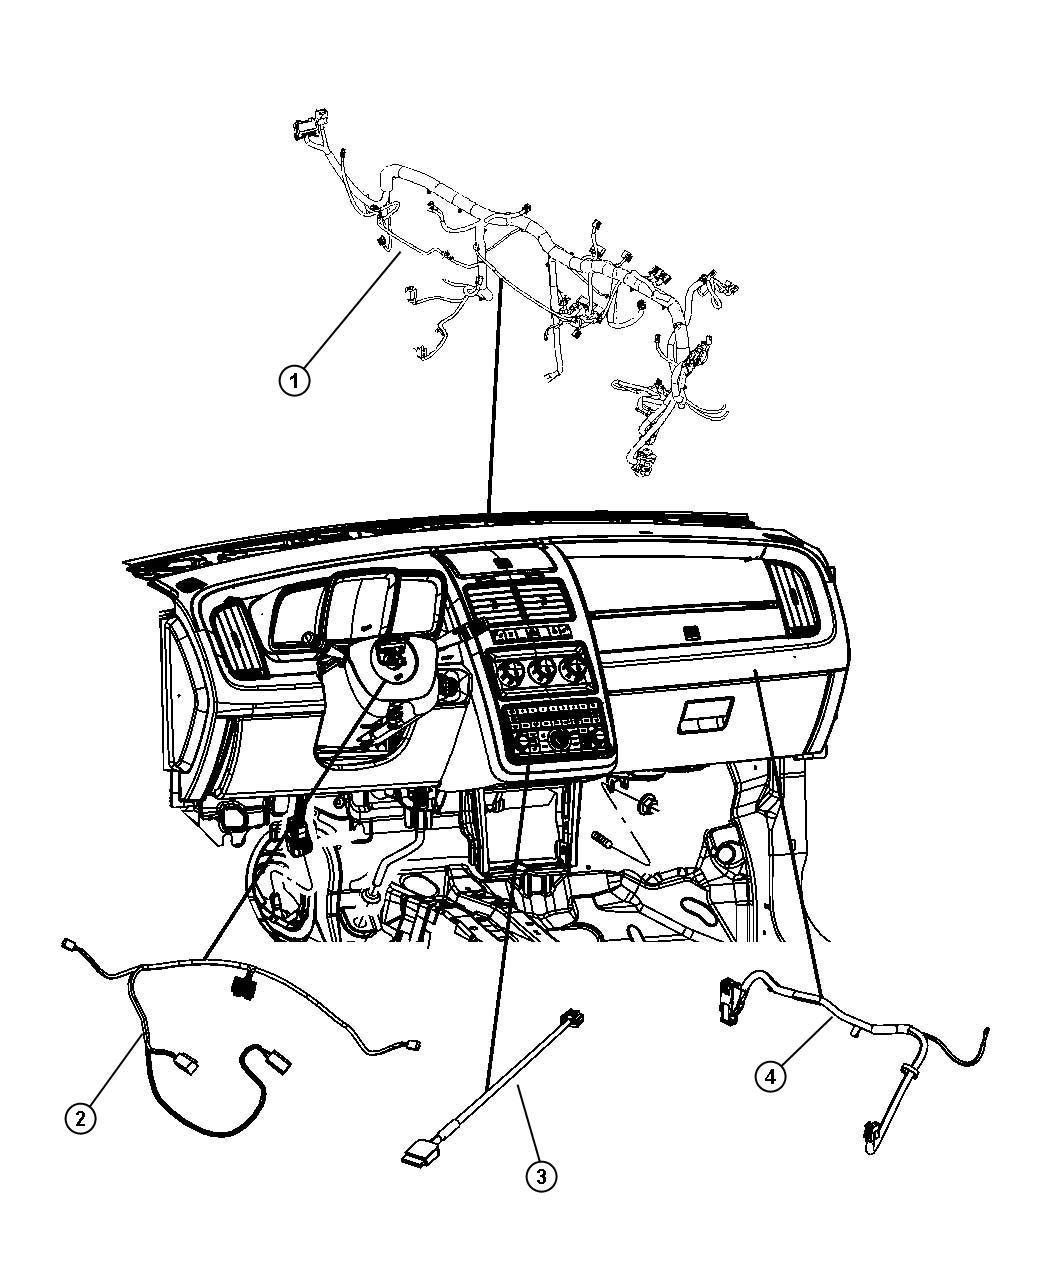 2010 Dodge Journey Wiring. Overlay. Instrument, panel